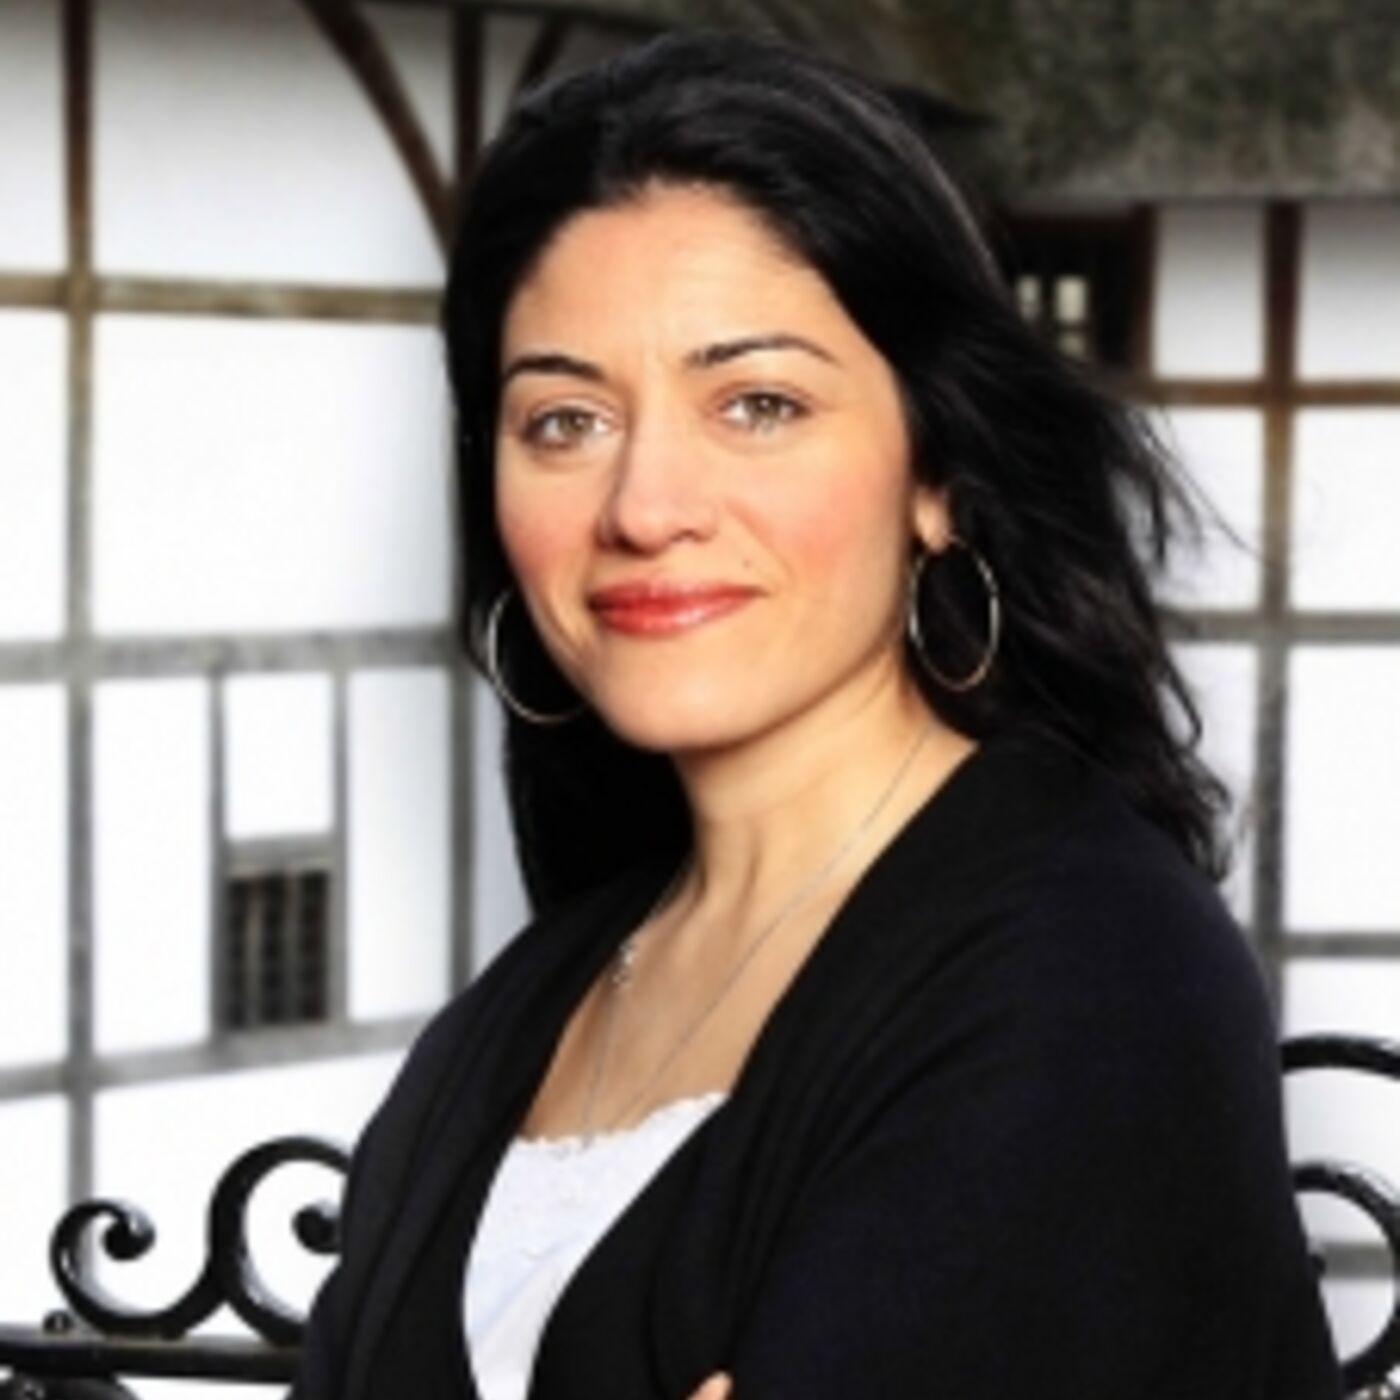 S1:E4:Farah-Karim Cooper on Shakespeare's Globe, Sam Wanamaker Playhouse, Cosmetics, Gestures